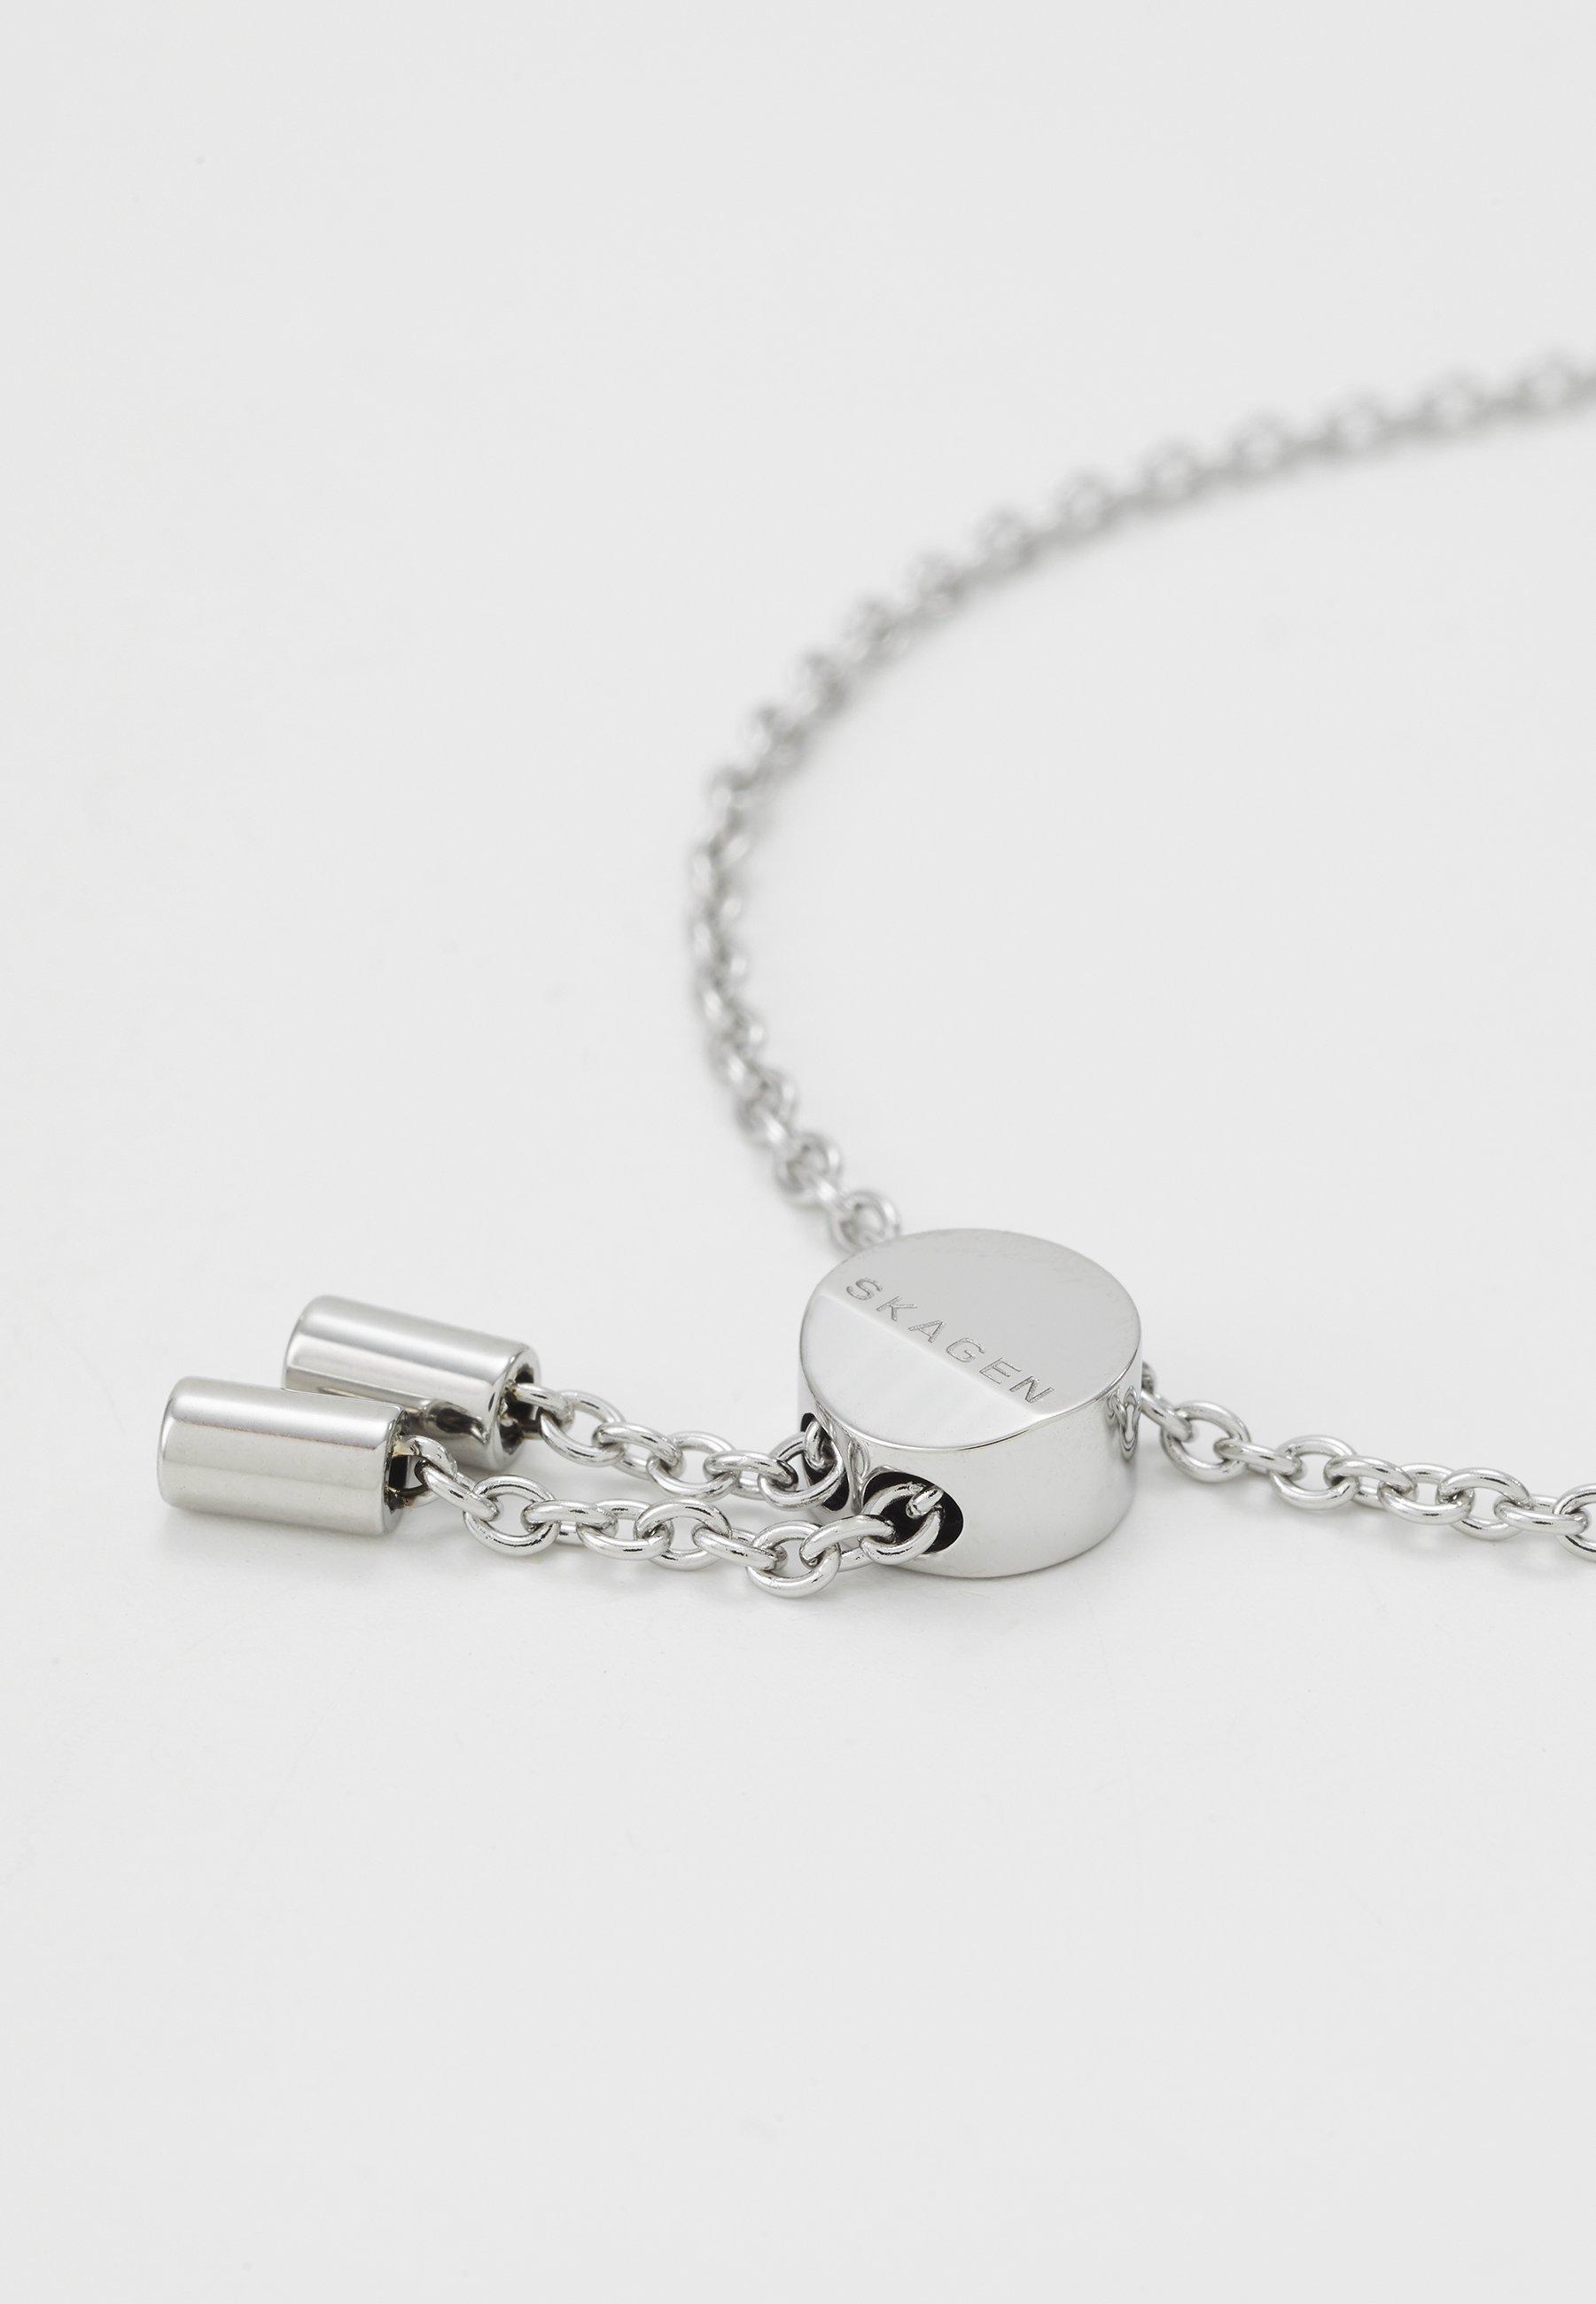 Skagen Sea Glass - Armband Silver-coloured/silberfarben